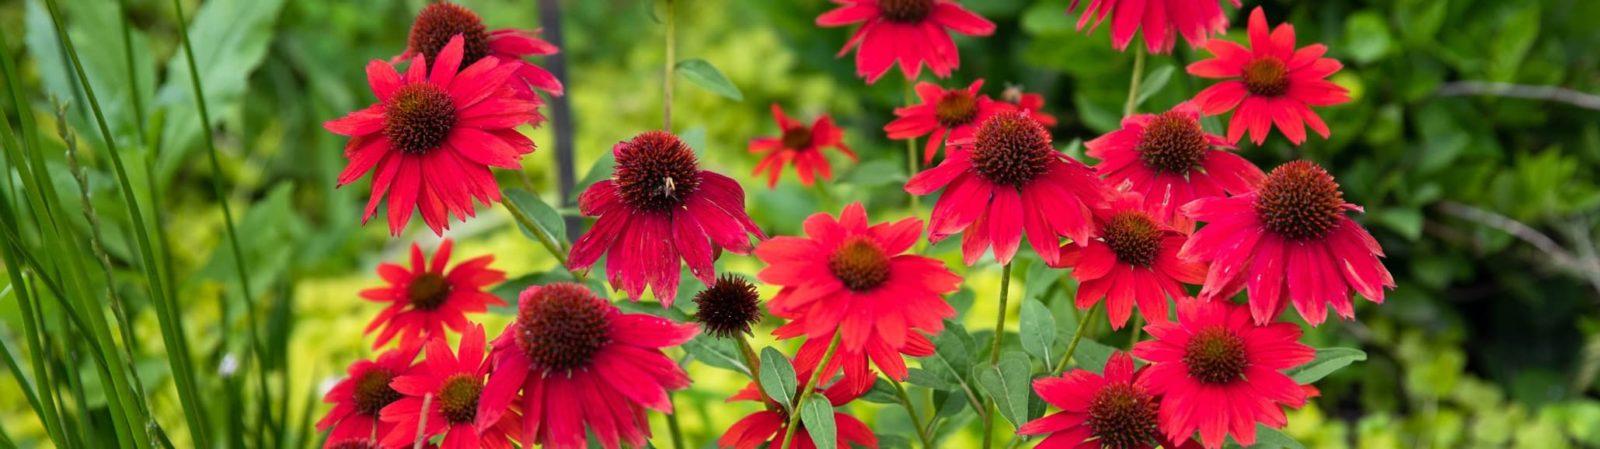 red coneflowers in a garden